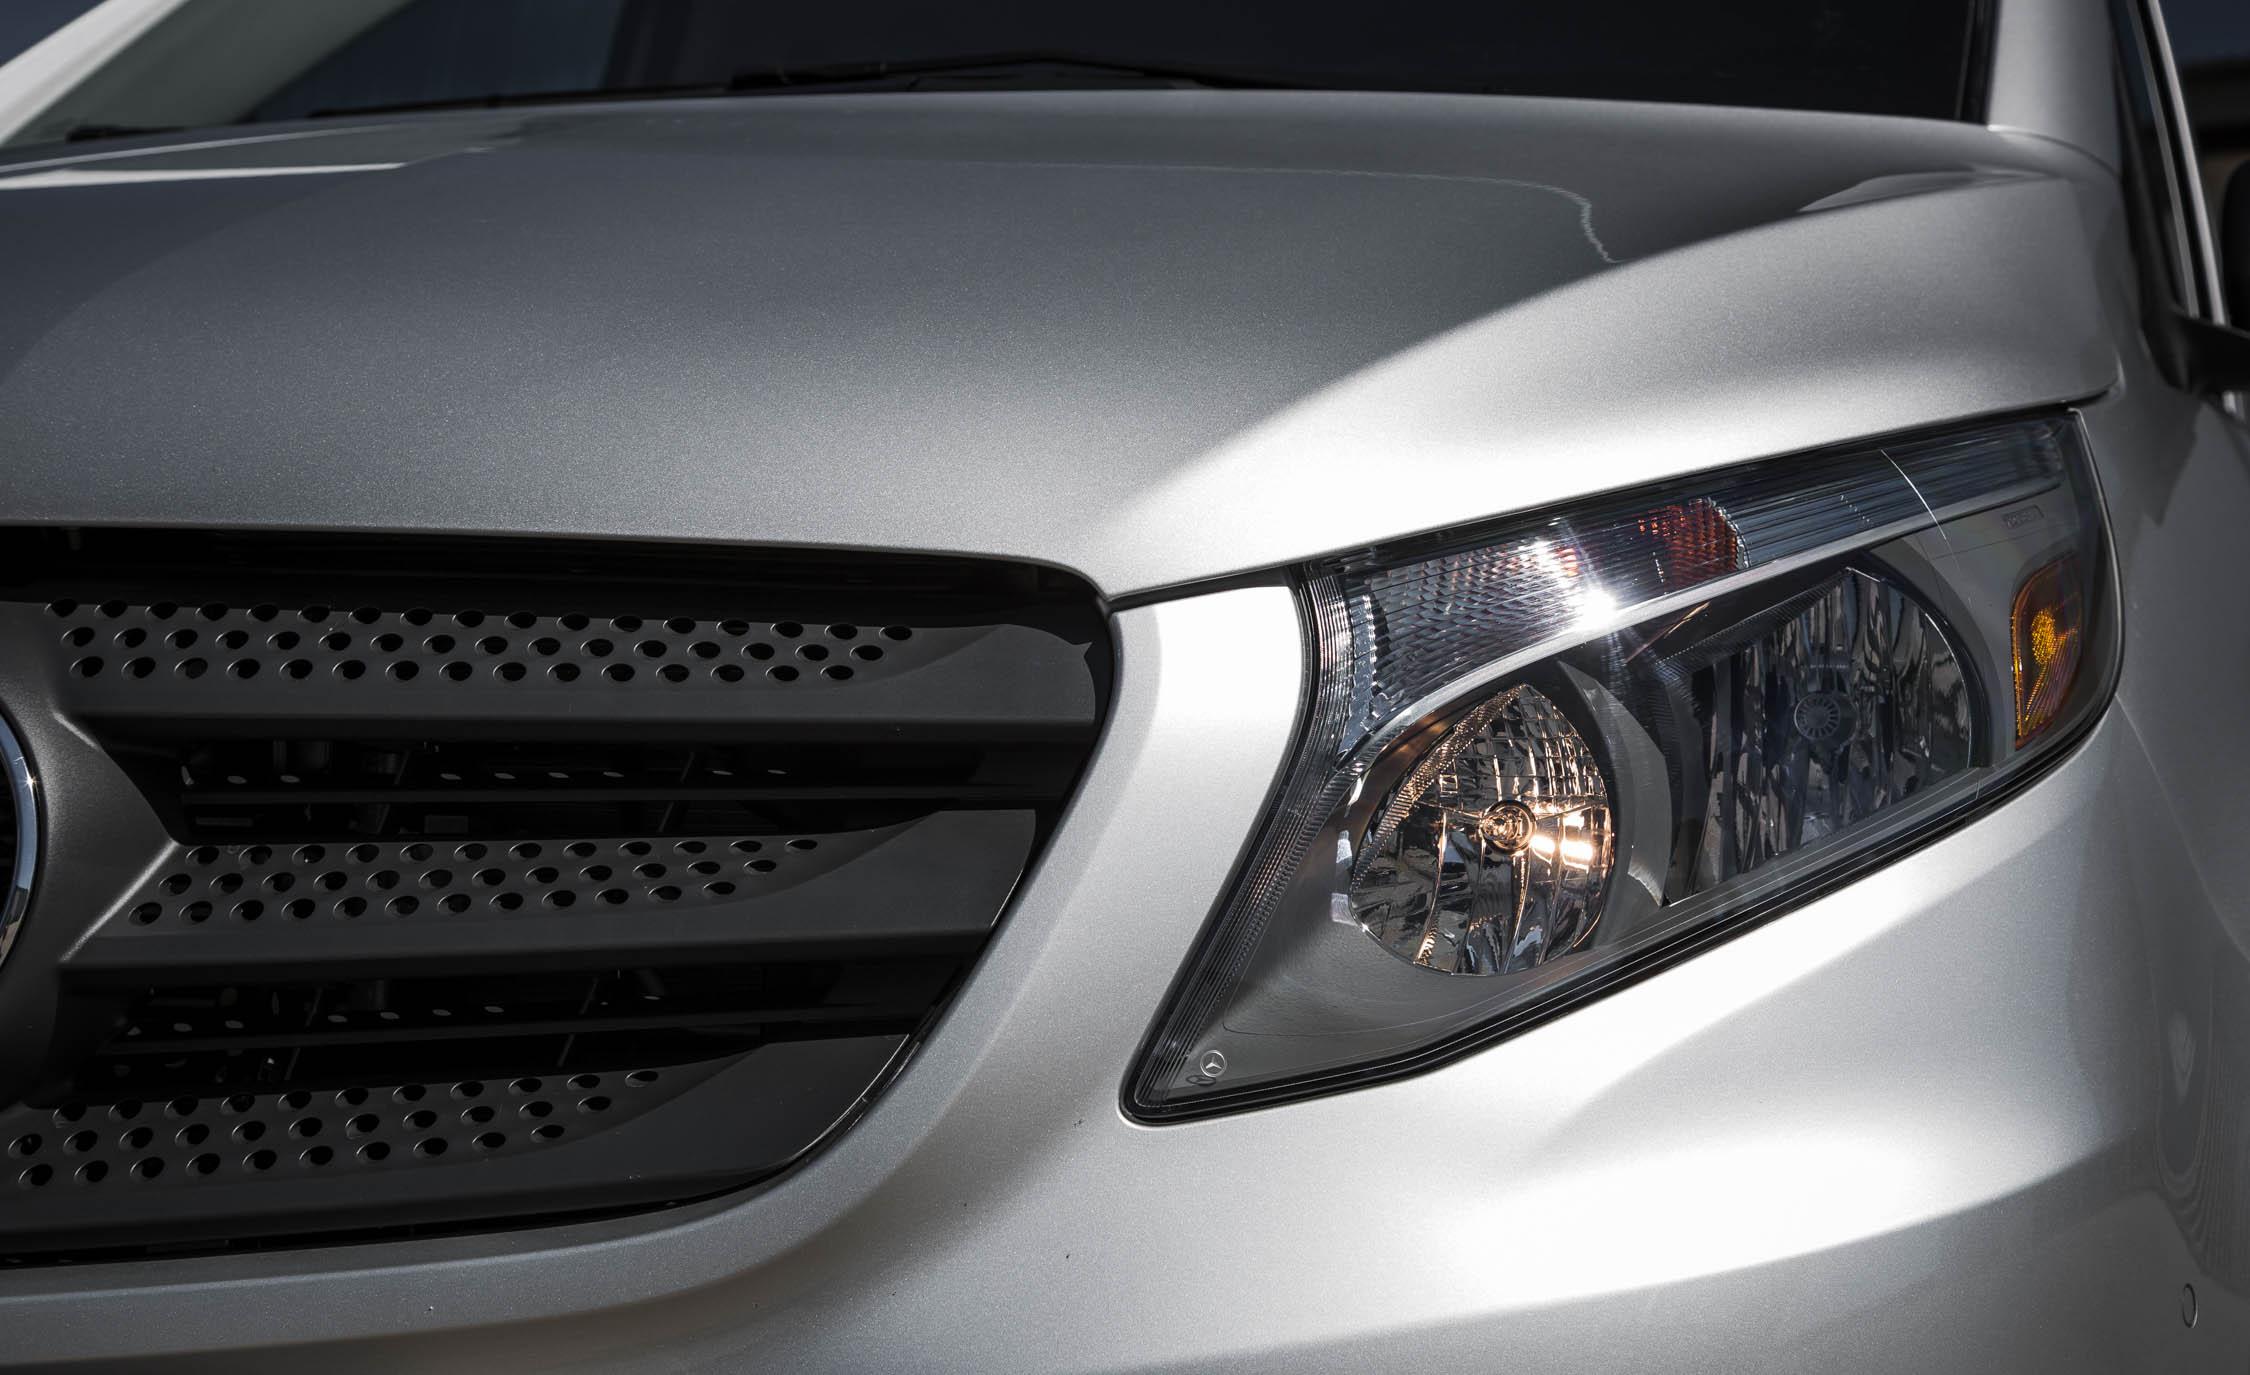 2016 Mercedes-Benz Metris Exterior Headlight